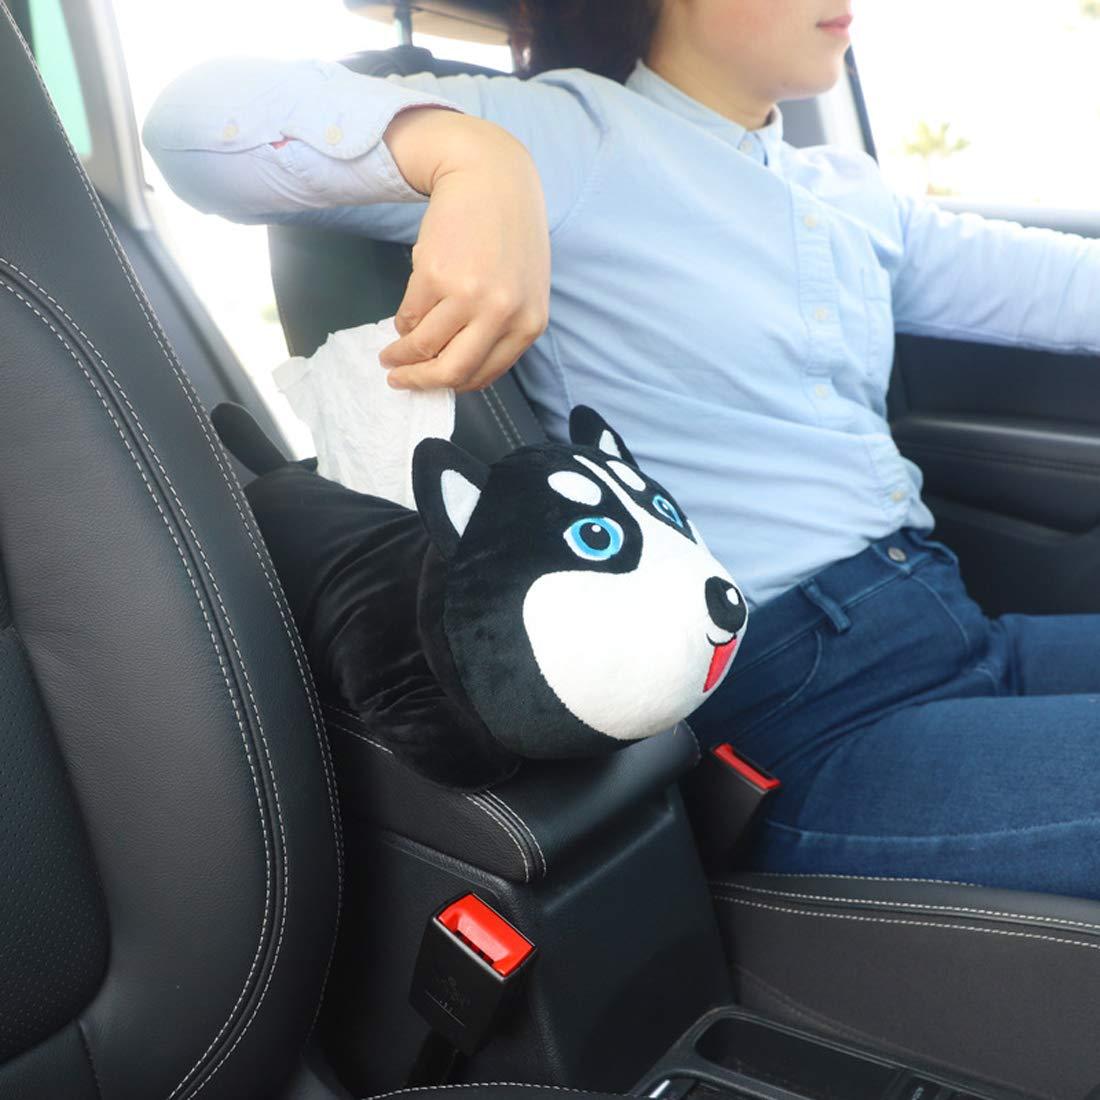 Ewindy Creative Car Armrest Box Cartoon Tissue Box Multifunctional Cute Plush Animal Car Tissue Cover Car Interior Products Car Accessories Beige Bear, As Description